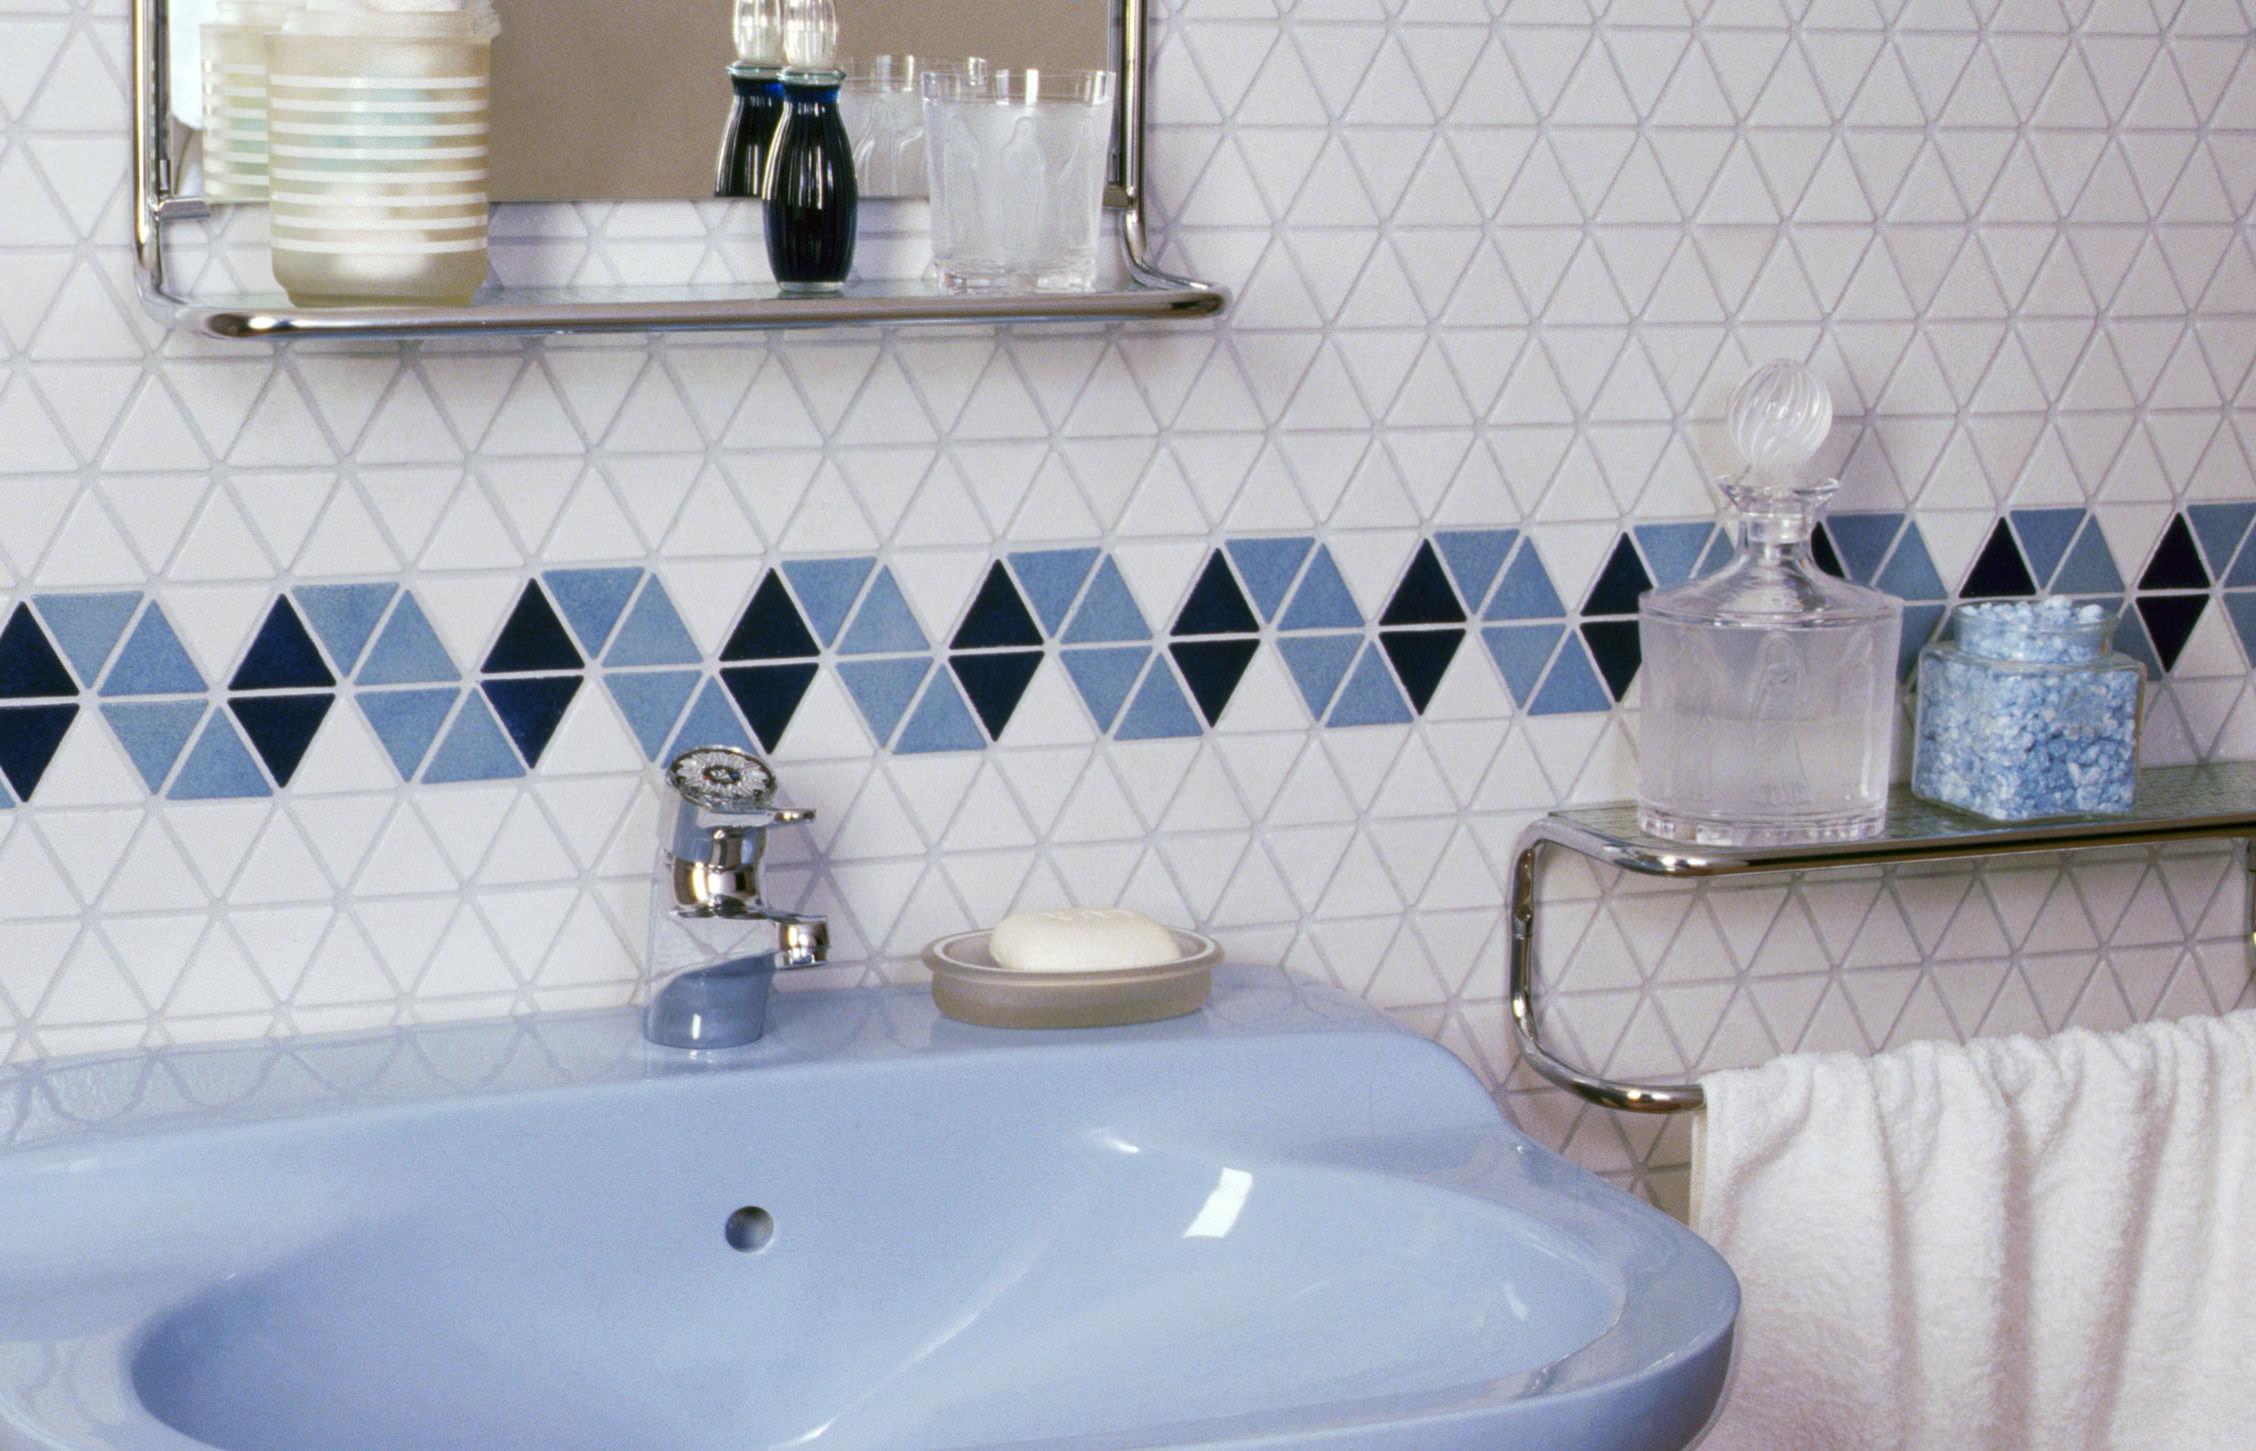 Indoor mosaic tile / bathroom / wall / ceramic - TRIO - EMAUX DE BRIARE